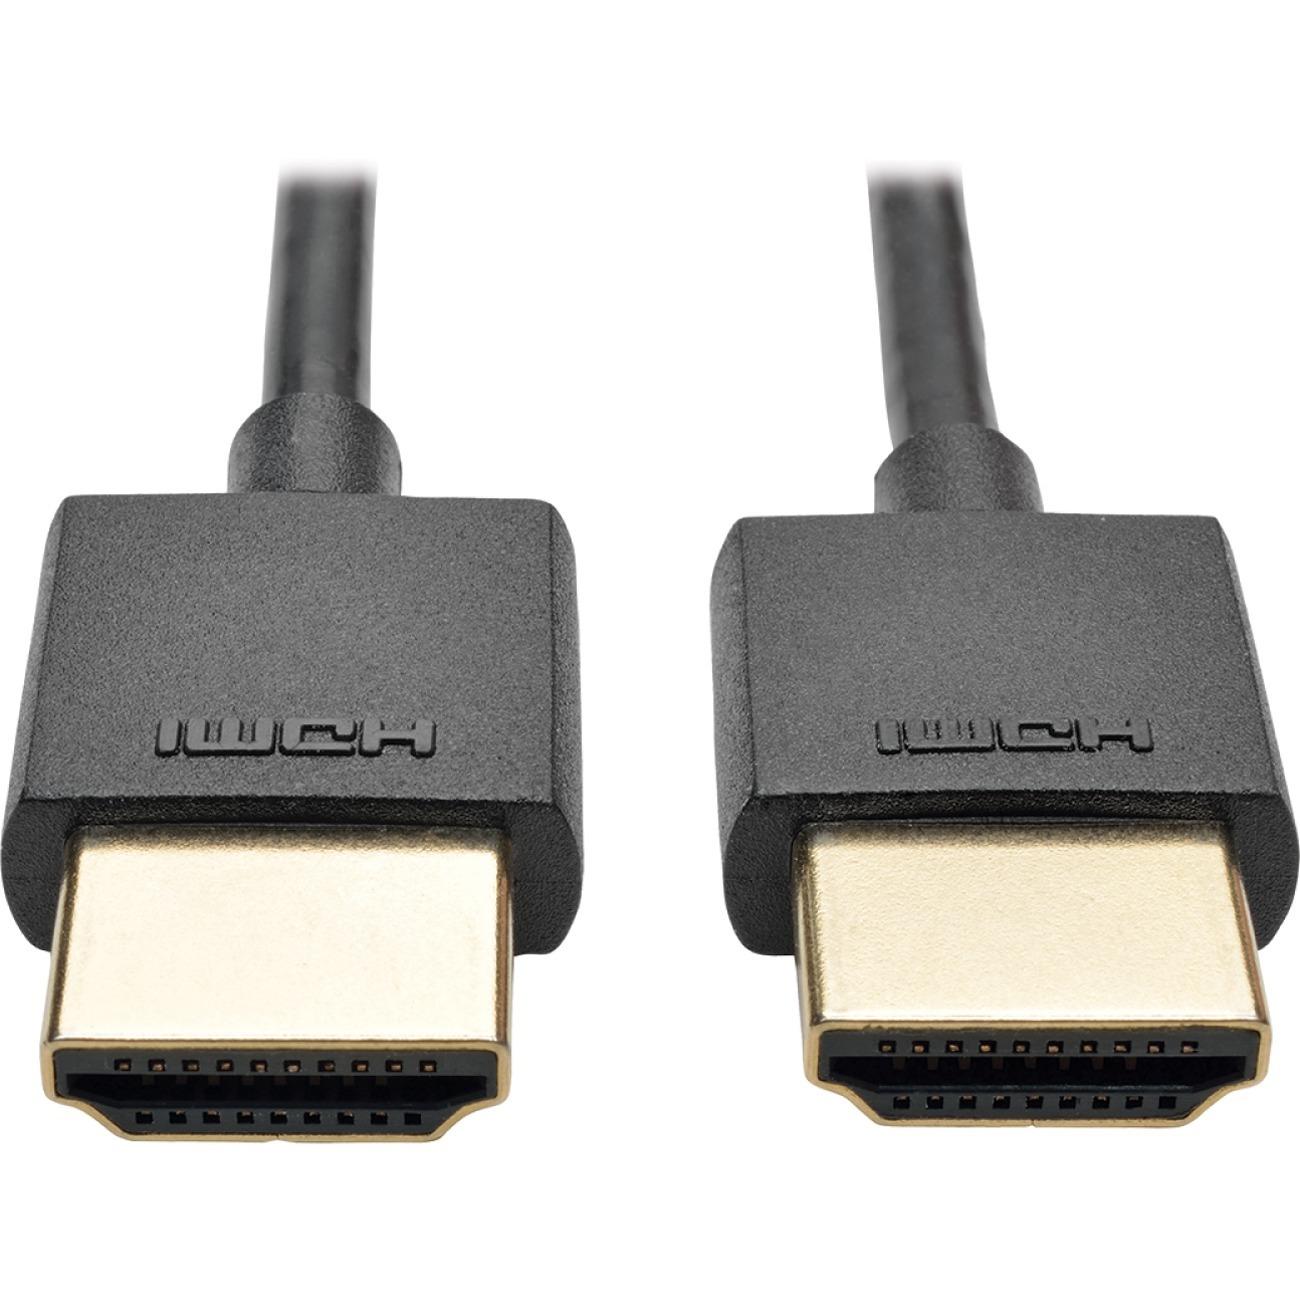 Tripp Lite 6ft Hi Speed Hdmi Cable W Ethernet Digital Video Slim Hdm1 Cabel Published